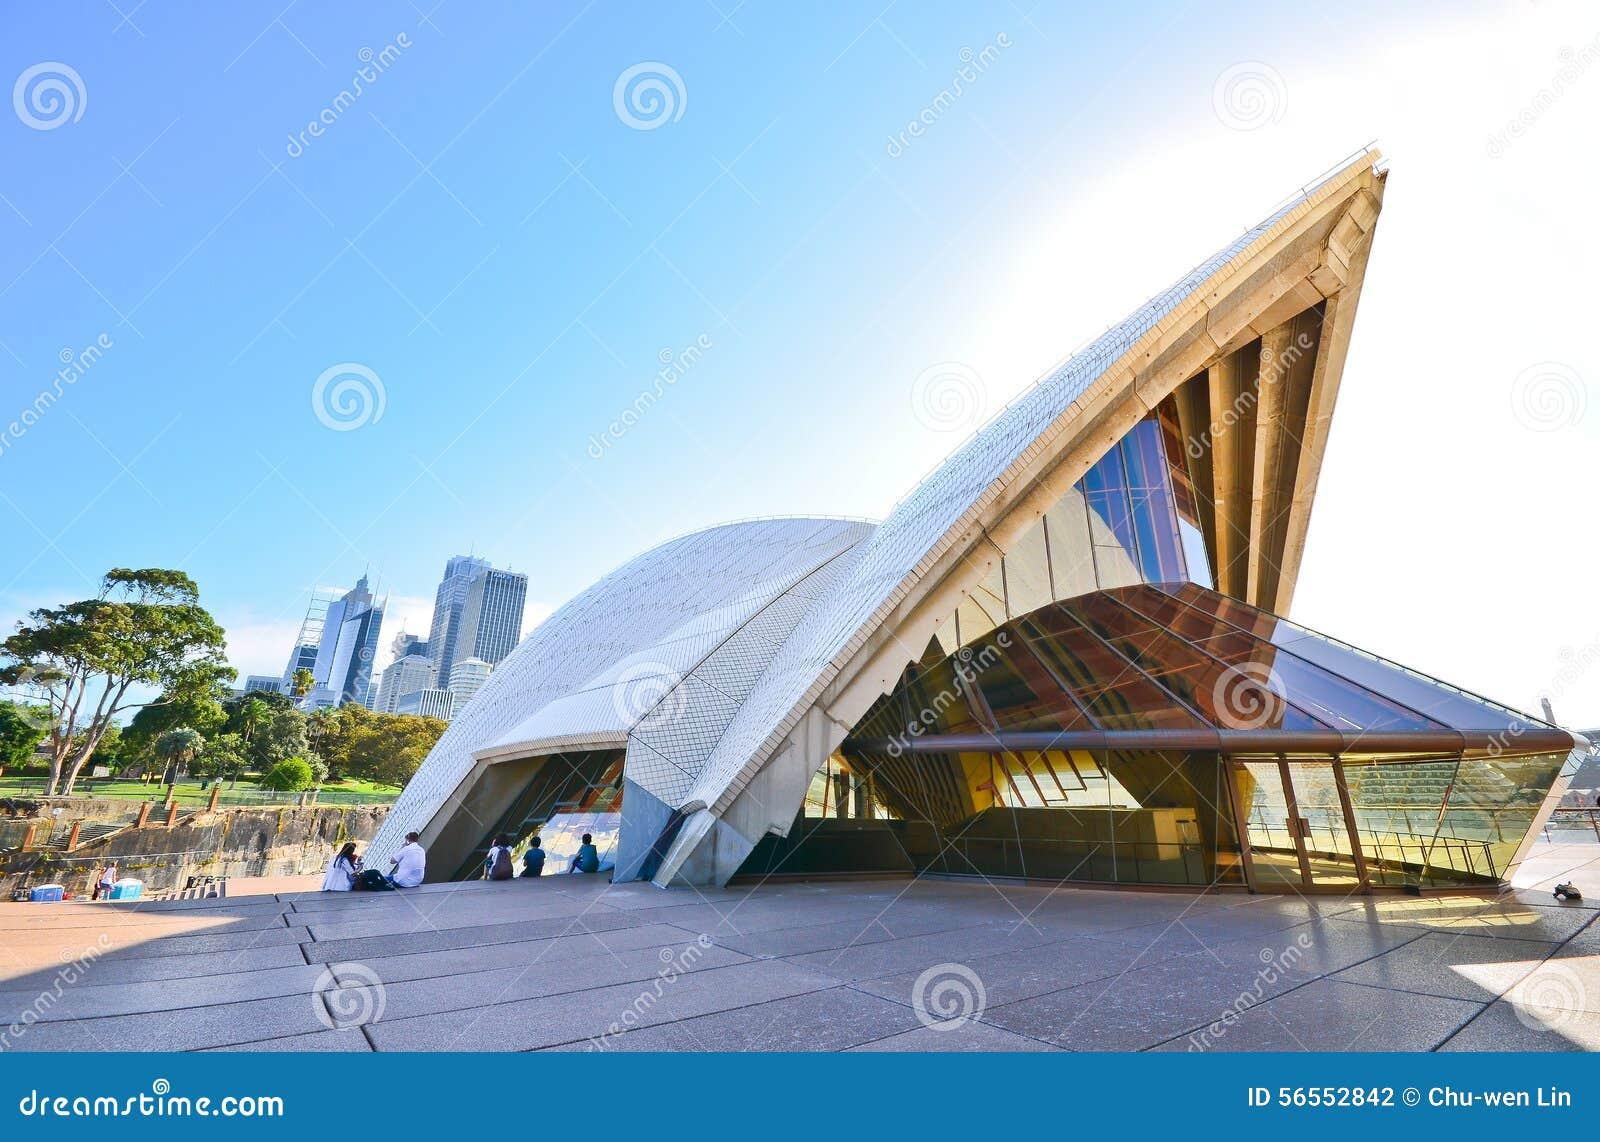 Download Άποψη της Όπερας του Σίδνεϊ Εκδοτική Φωτογραφία - εικόνα από αρχιτεκτονικής, σύγχρονος: 56552842